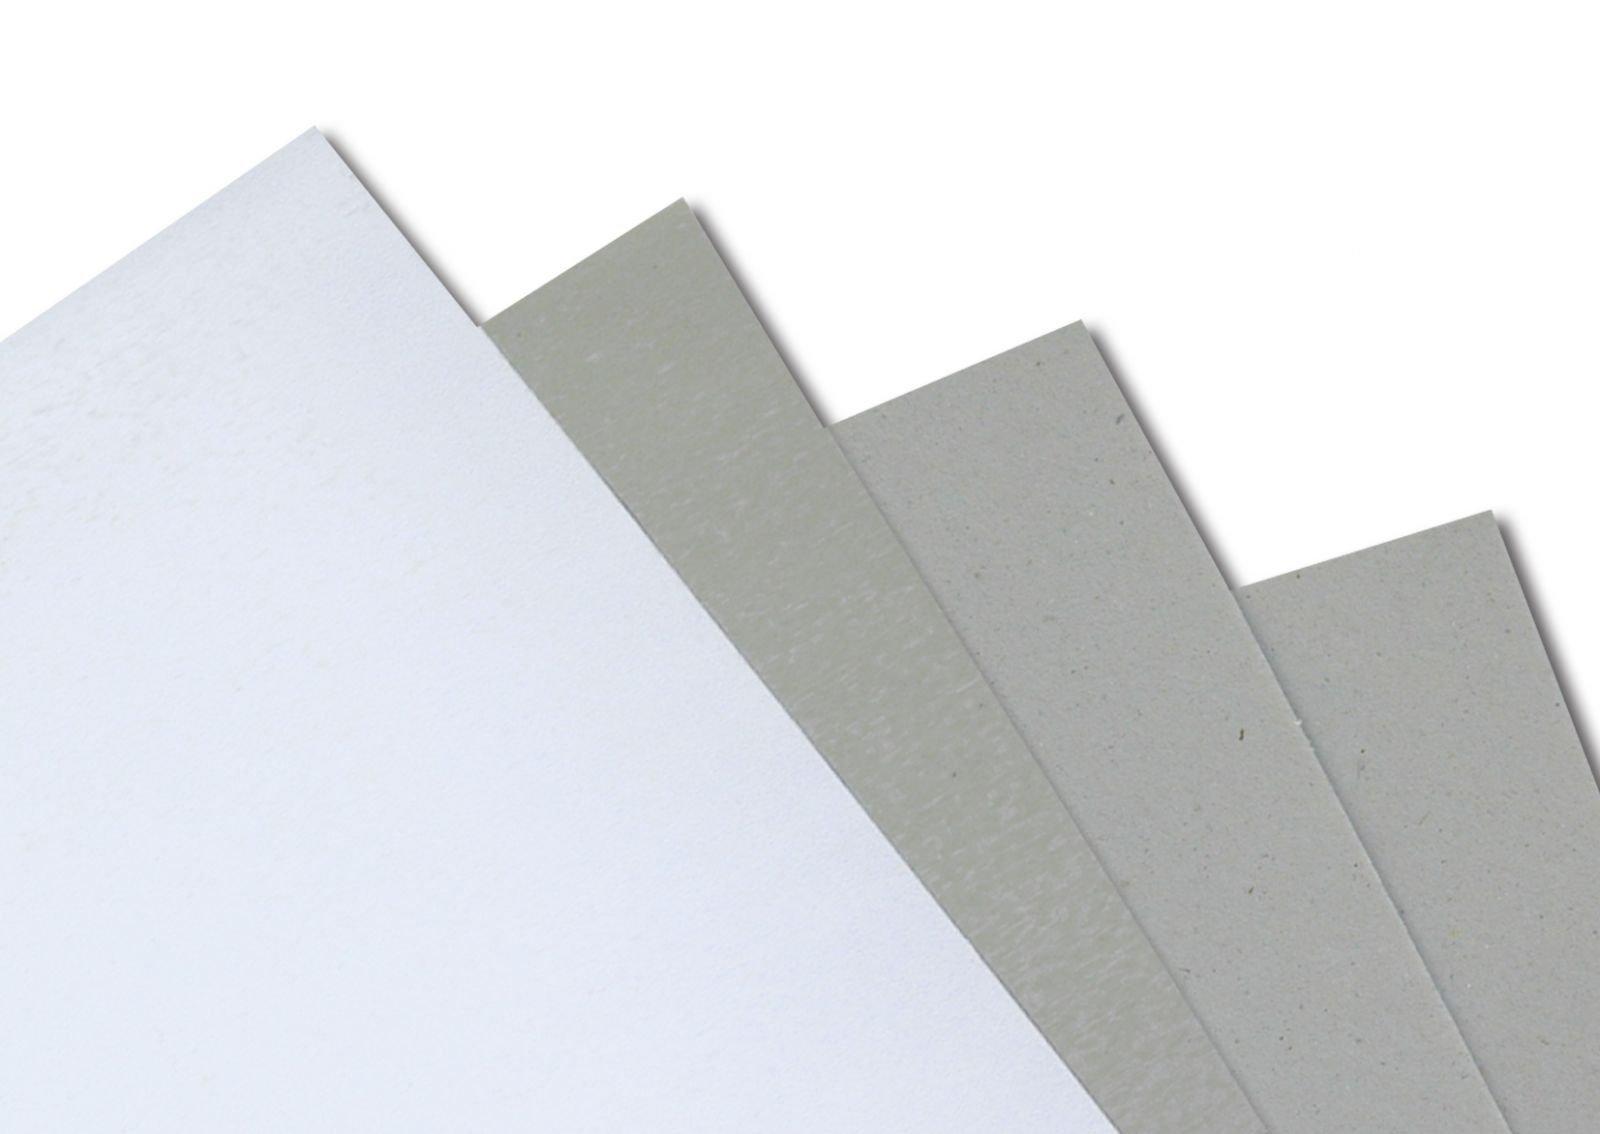 in túi giấy bằng giấy duplex